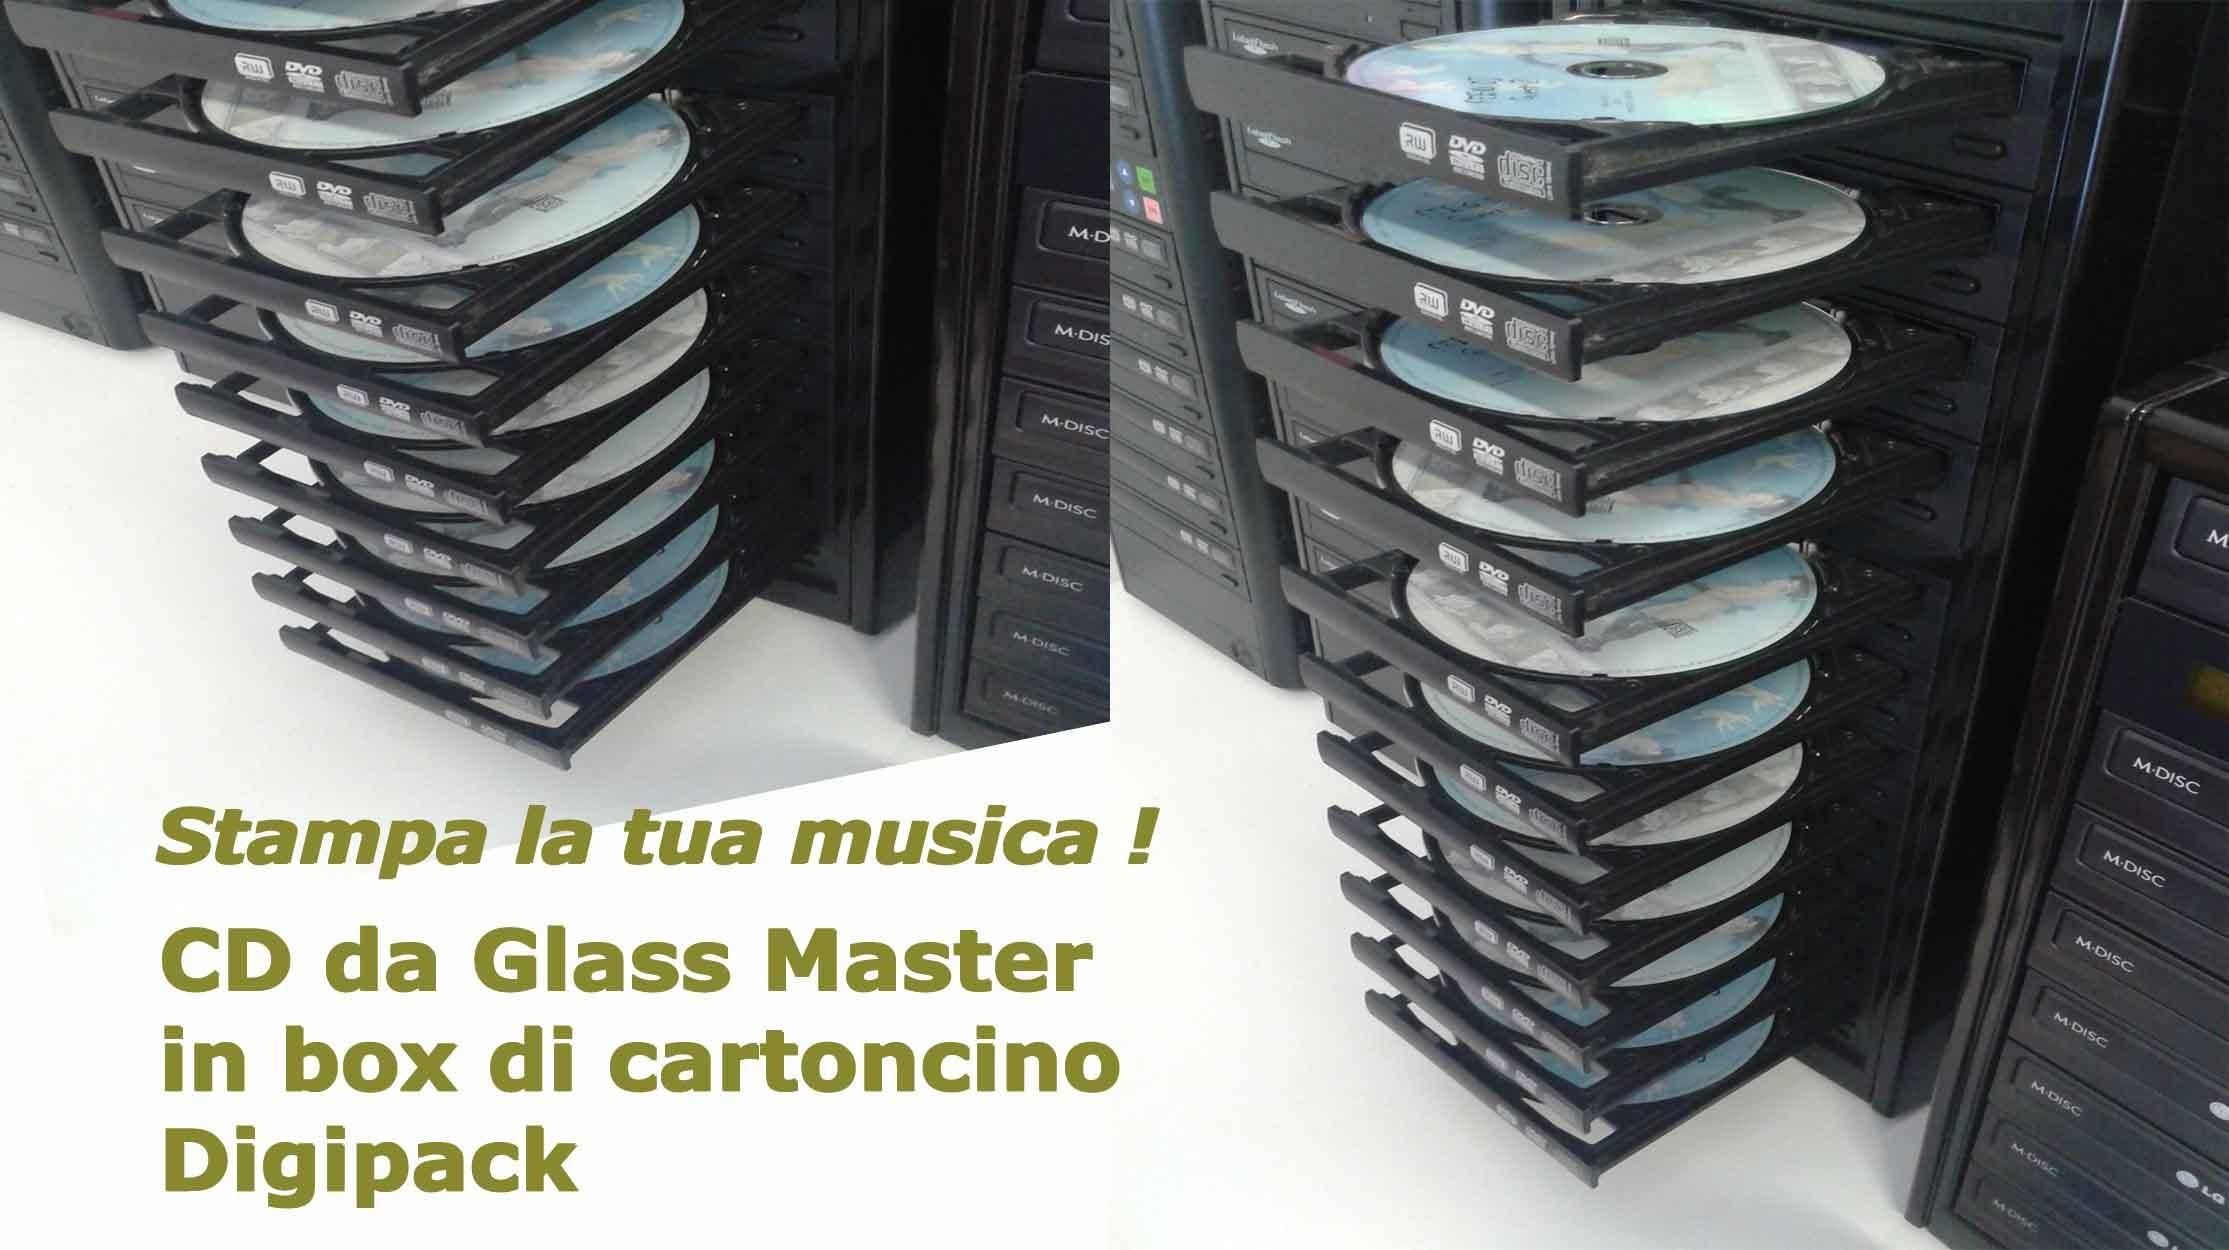 BackFlip-stampalatuamusica